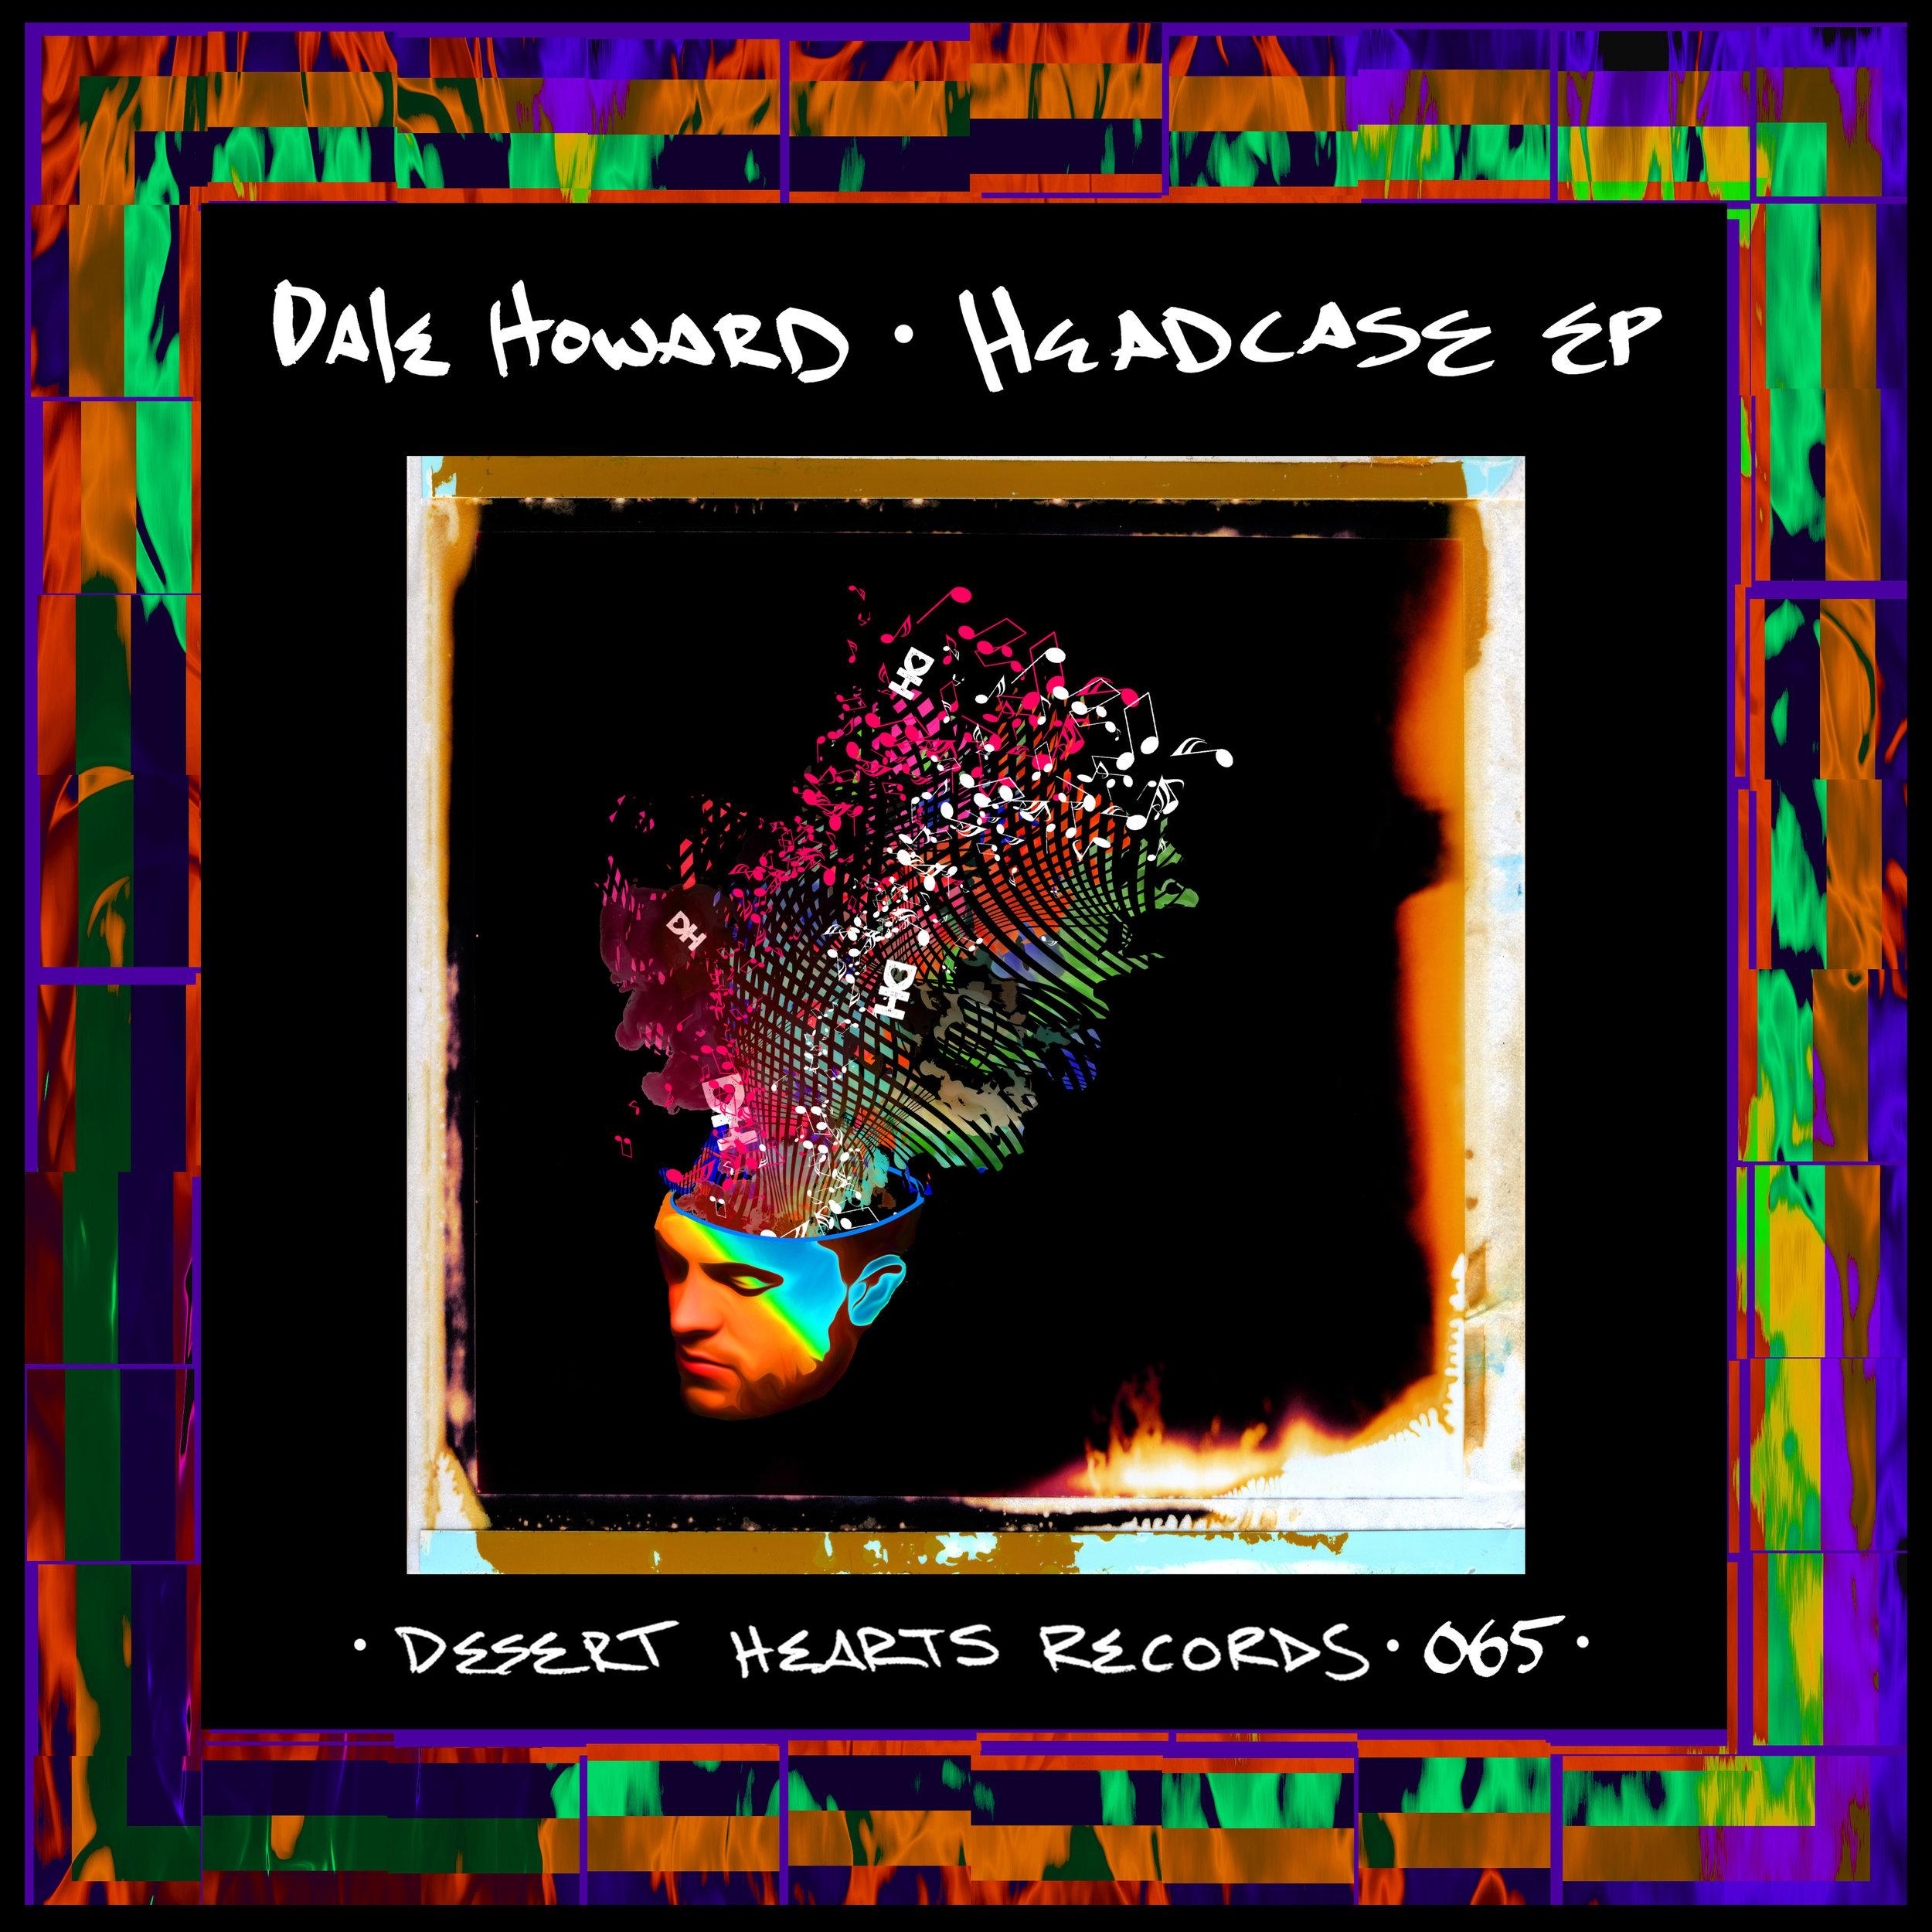 [DH065] Dale Howard - Headcase EP.jpg